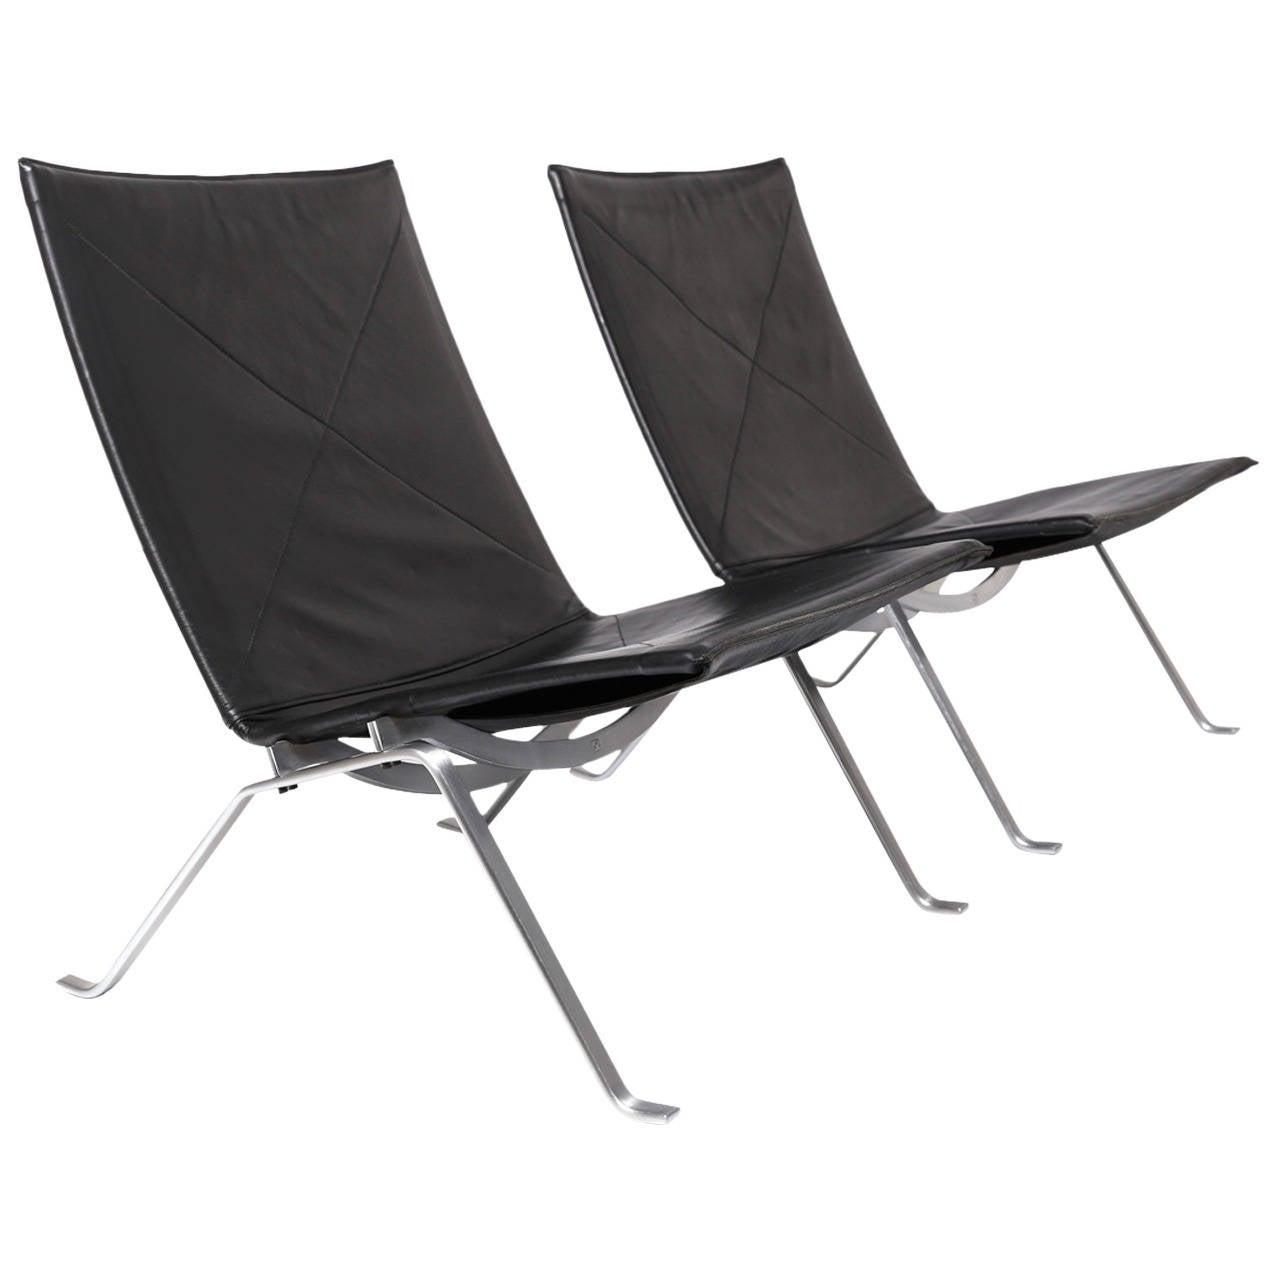 PK22 Chairs By Poul Kjaerholm For E Kold Christensen At 1stdibs